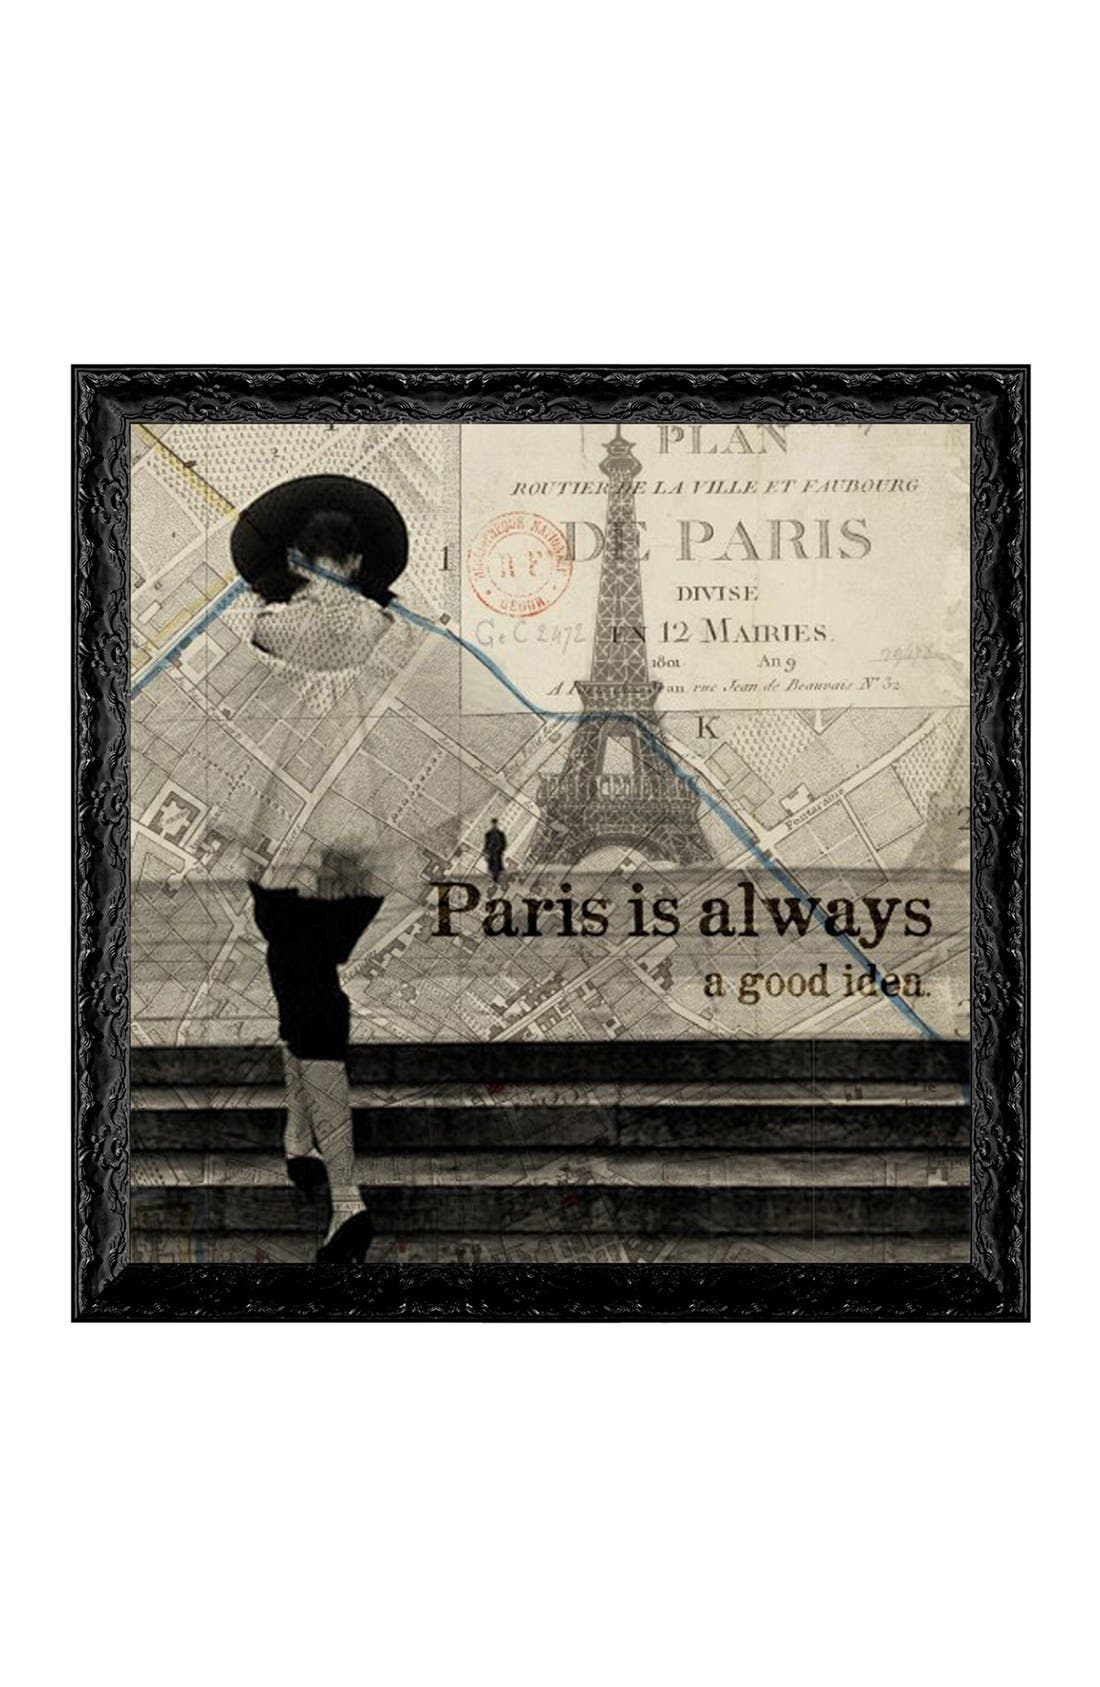 Alternate Image 1 Selected - Oliver Gal 'Paris Is Always a Good Idea' Framed Art Print